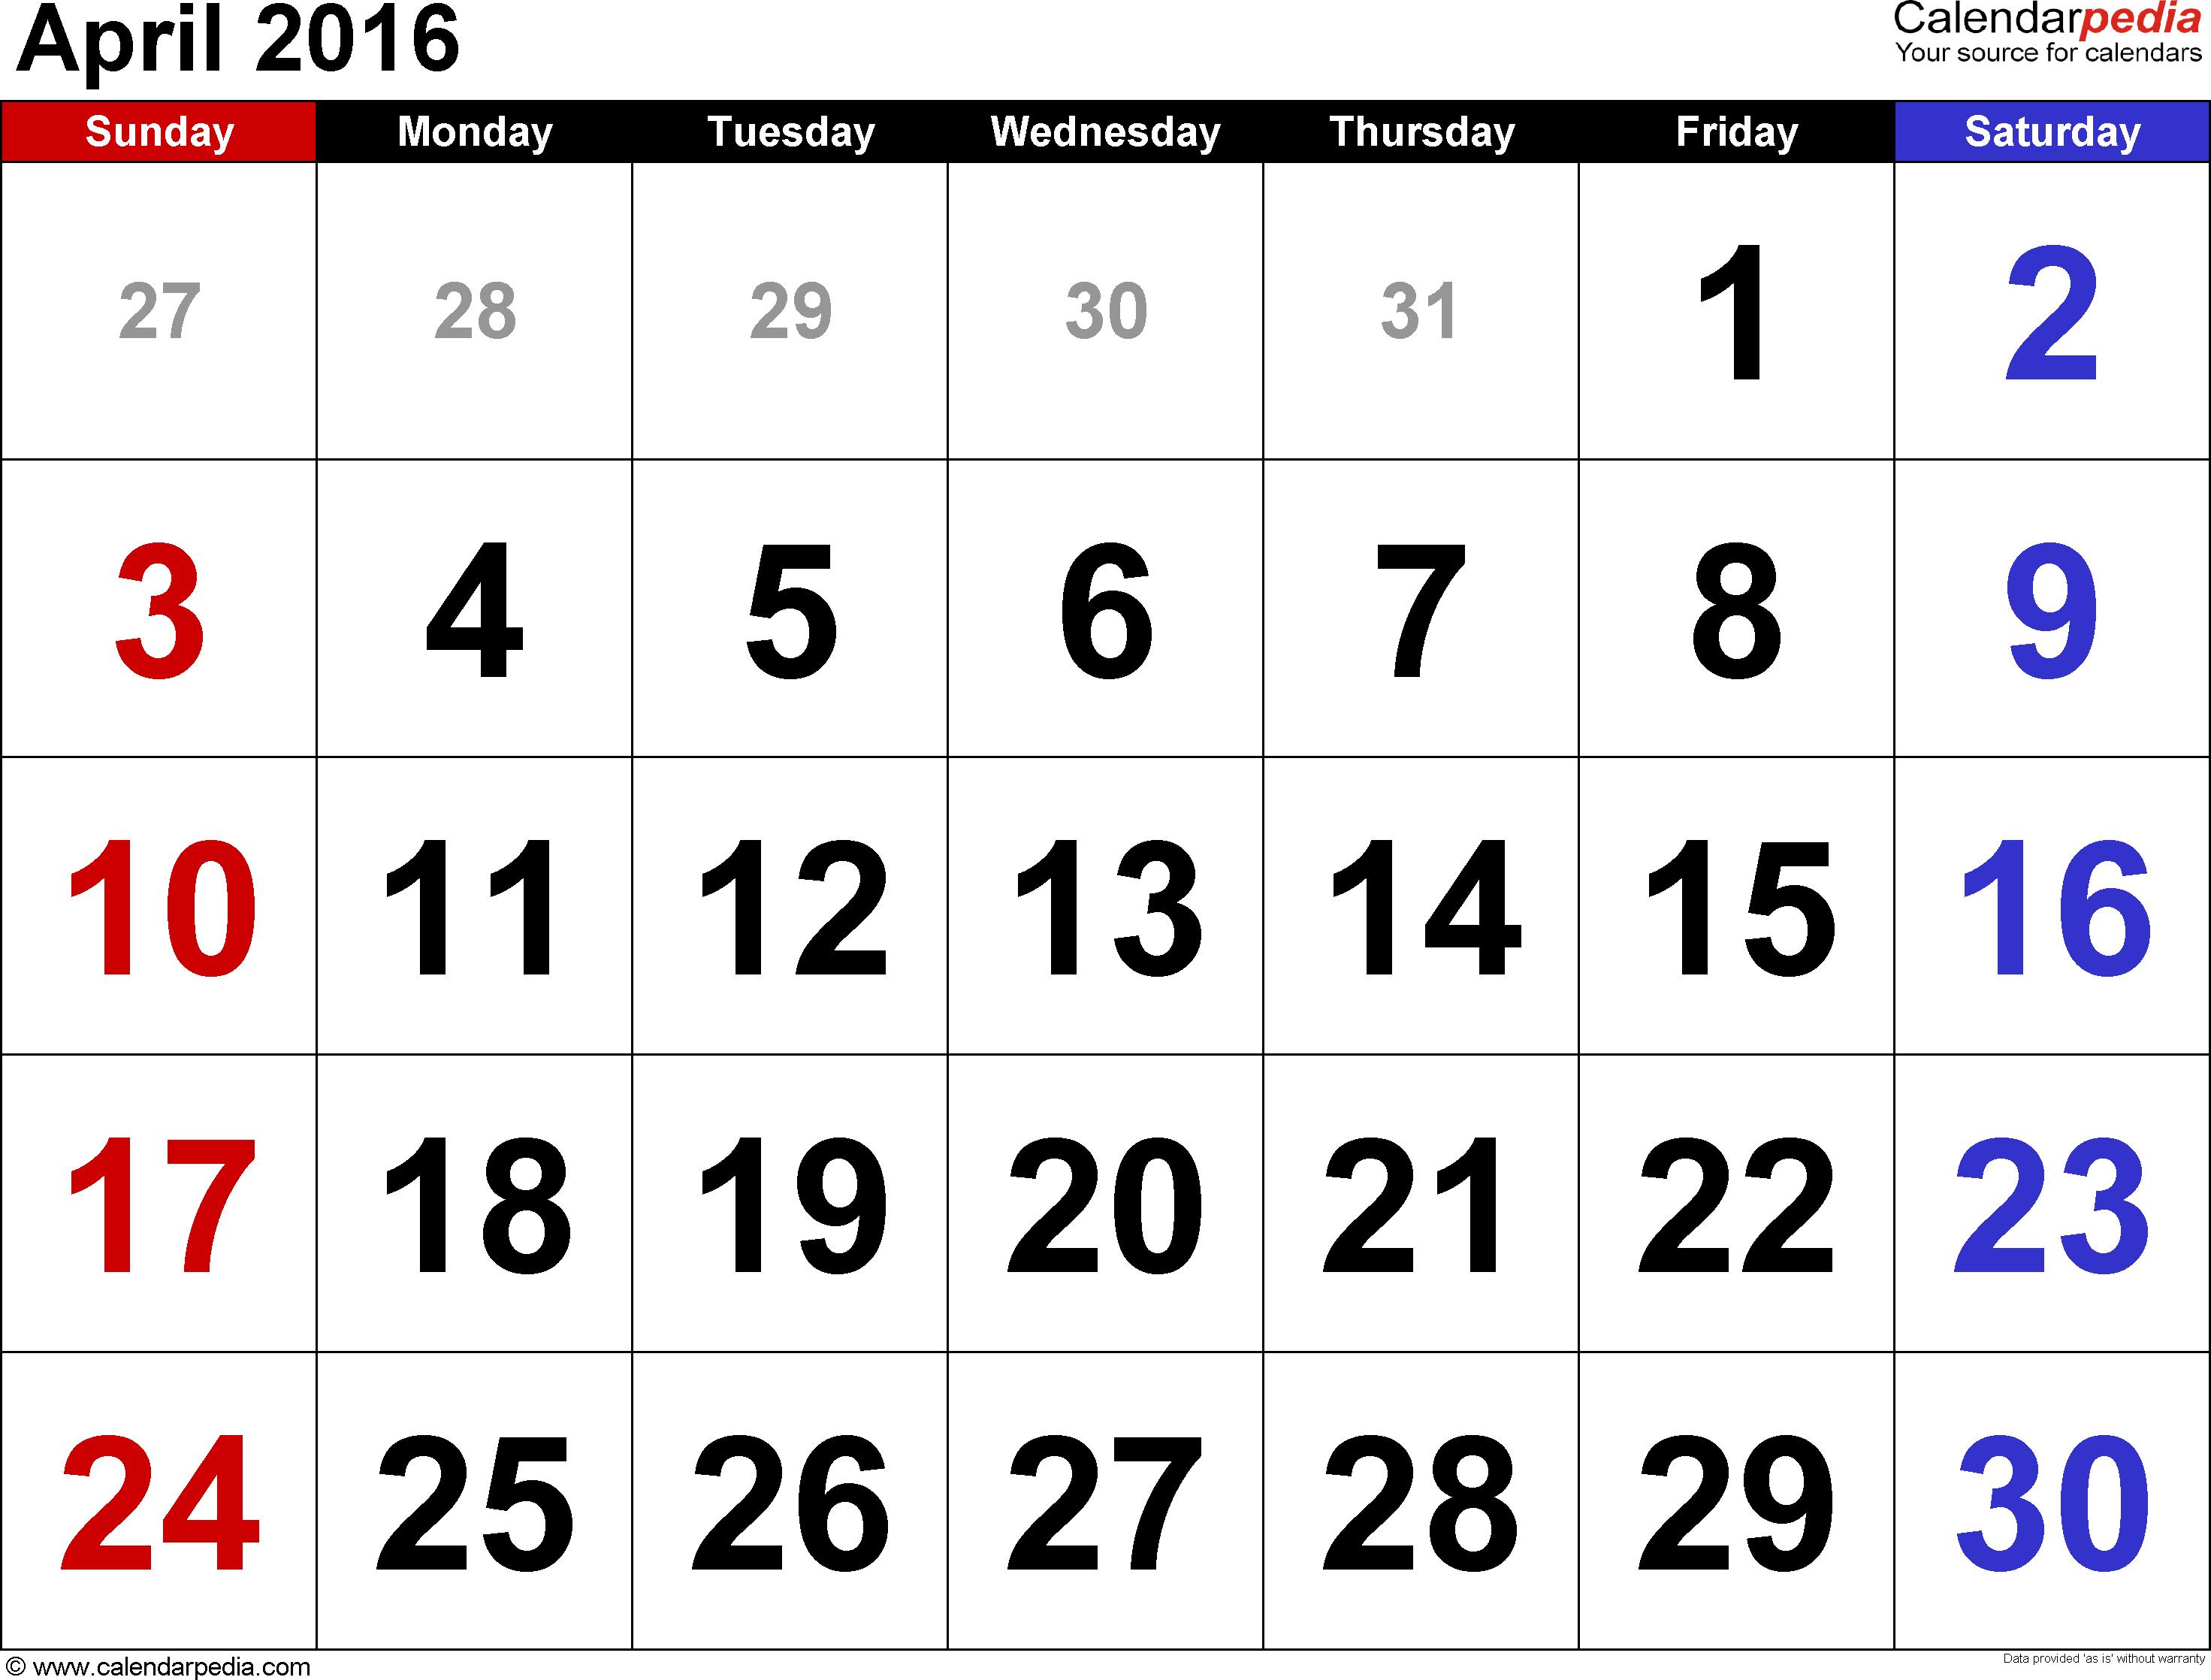 April 2016 calendar